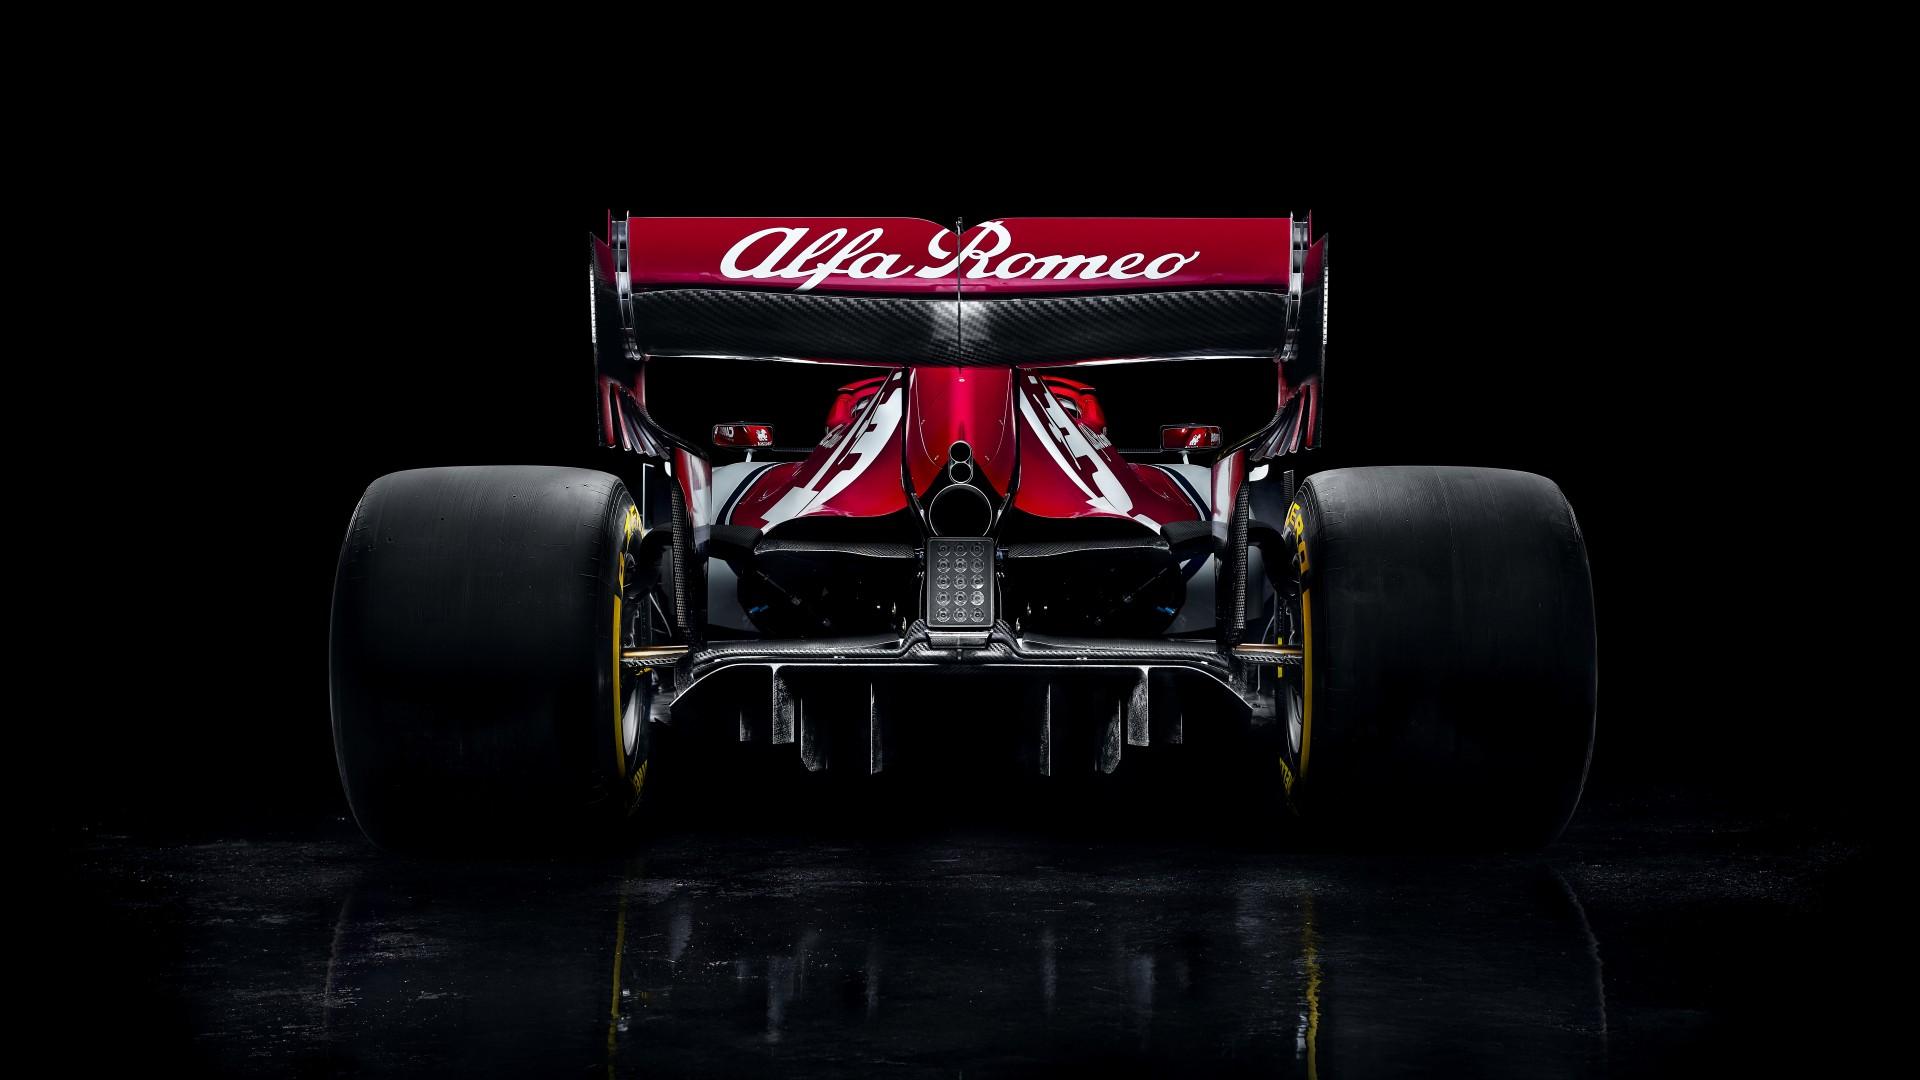 Hd Car Wallpapers For Android Tablets Alfa Romeo C38 Formula 1 2019 4k 8k Wallpaper Hd Car